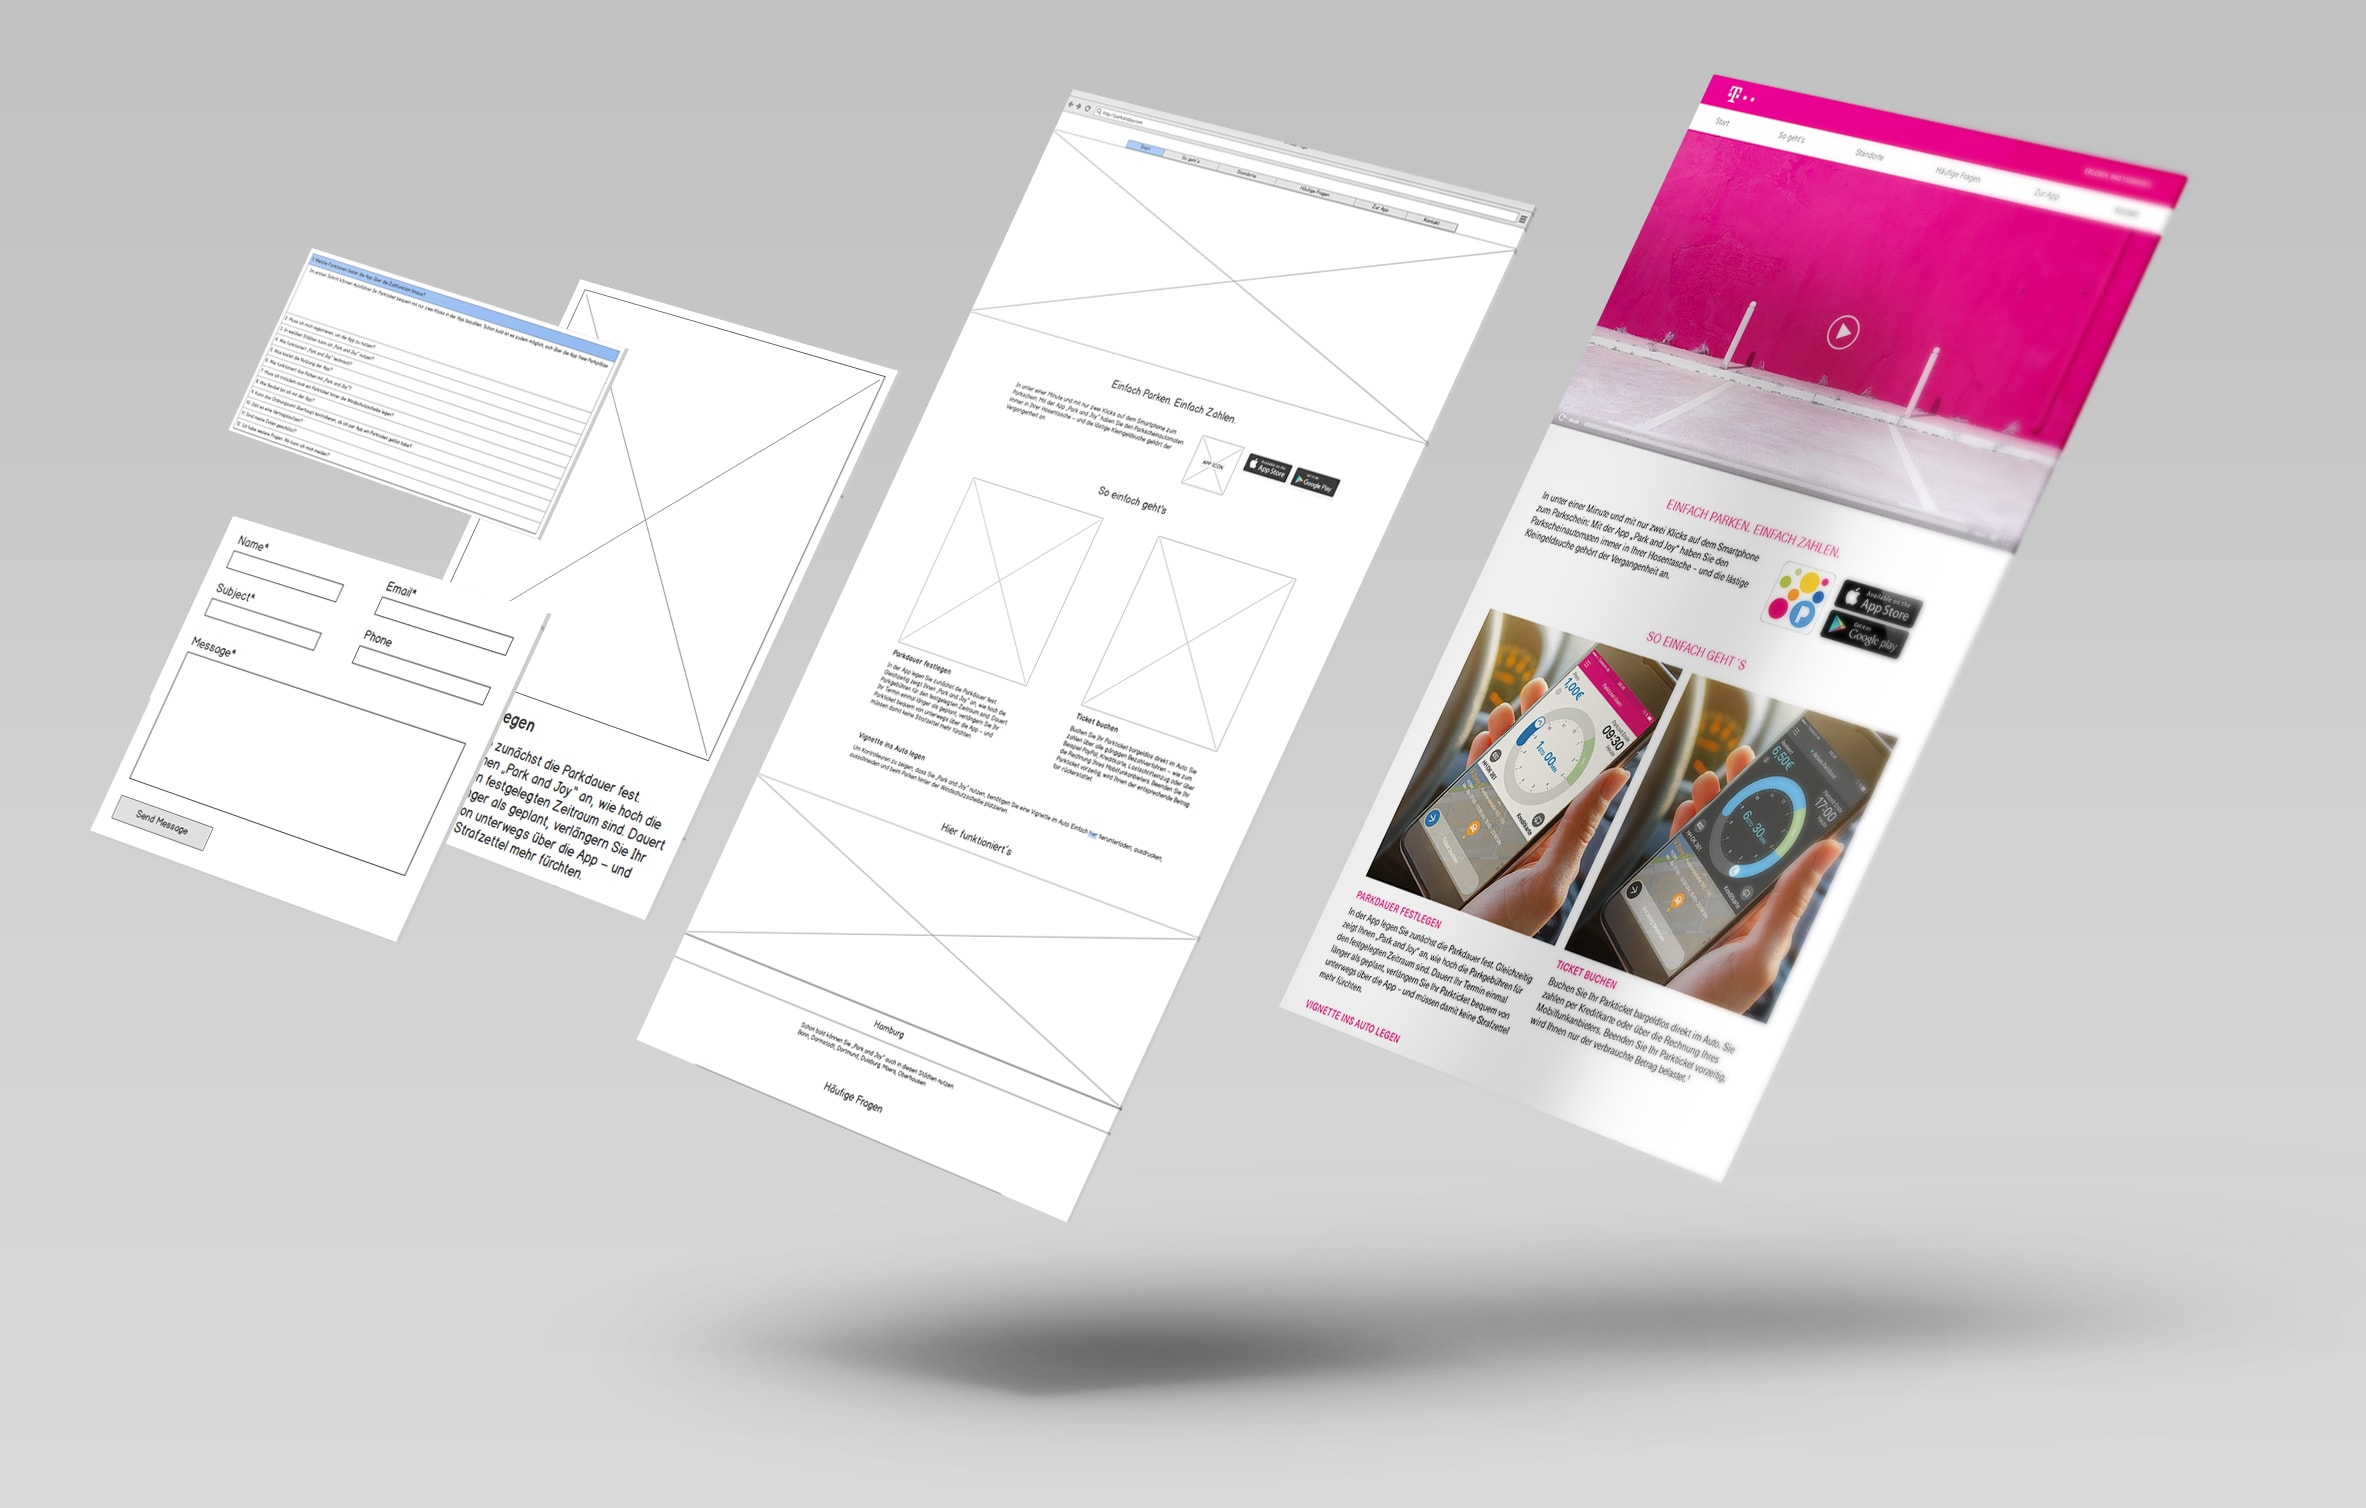 Deutsche Telekom ParkandJoy Process